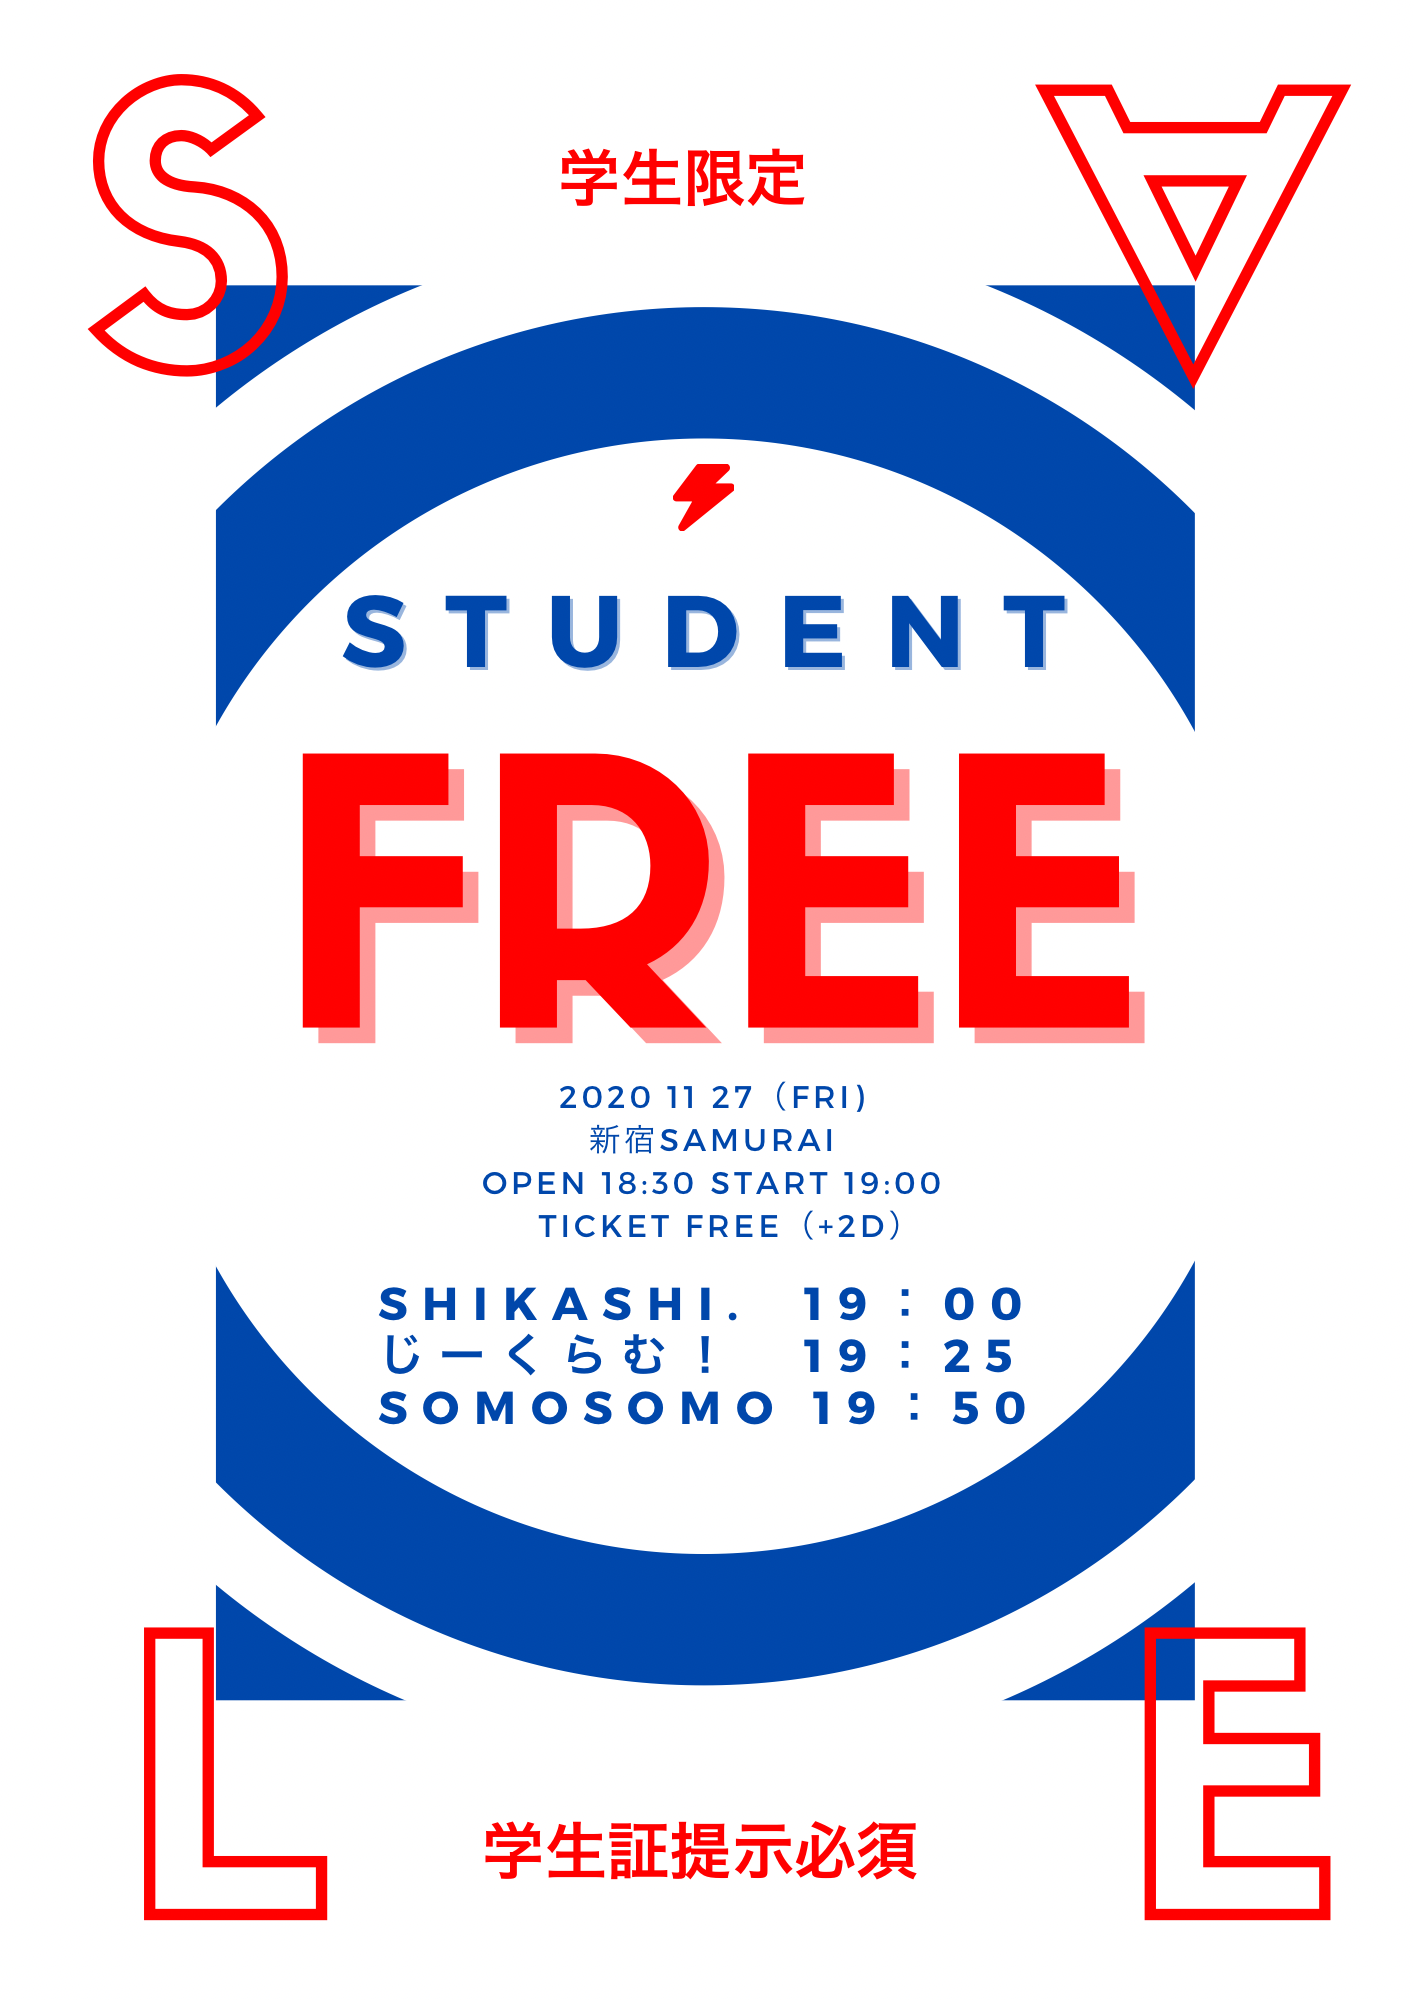 STUDENT FREE FREE FREE